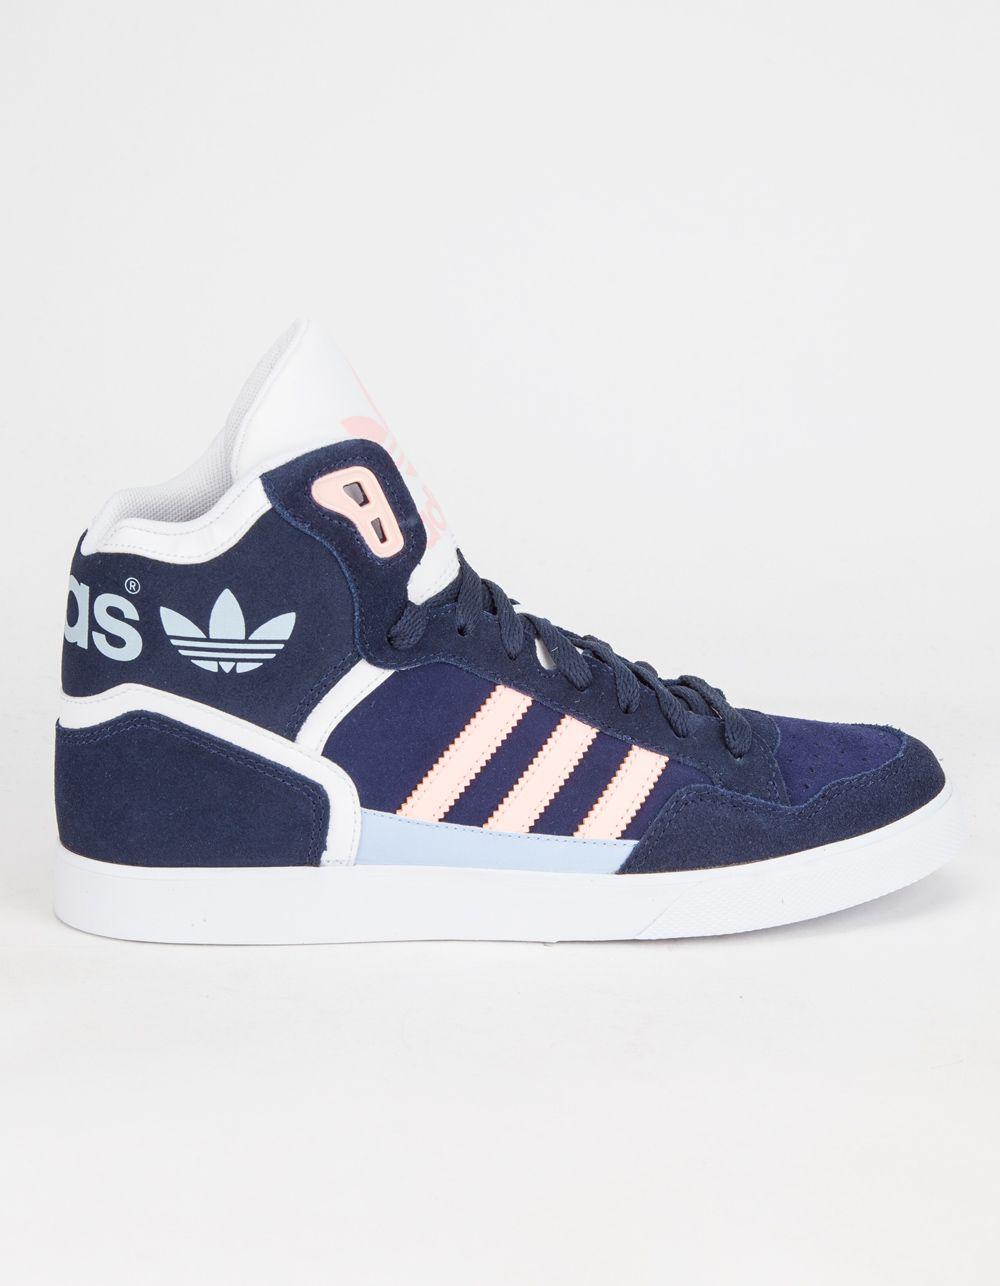 Adidas Originali Extaball Scarpe Donne Scarpe 265237210 Scarpe, Scarpe Extaball 26e269